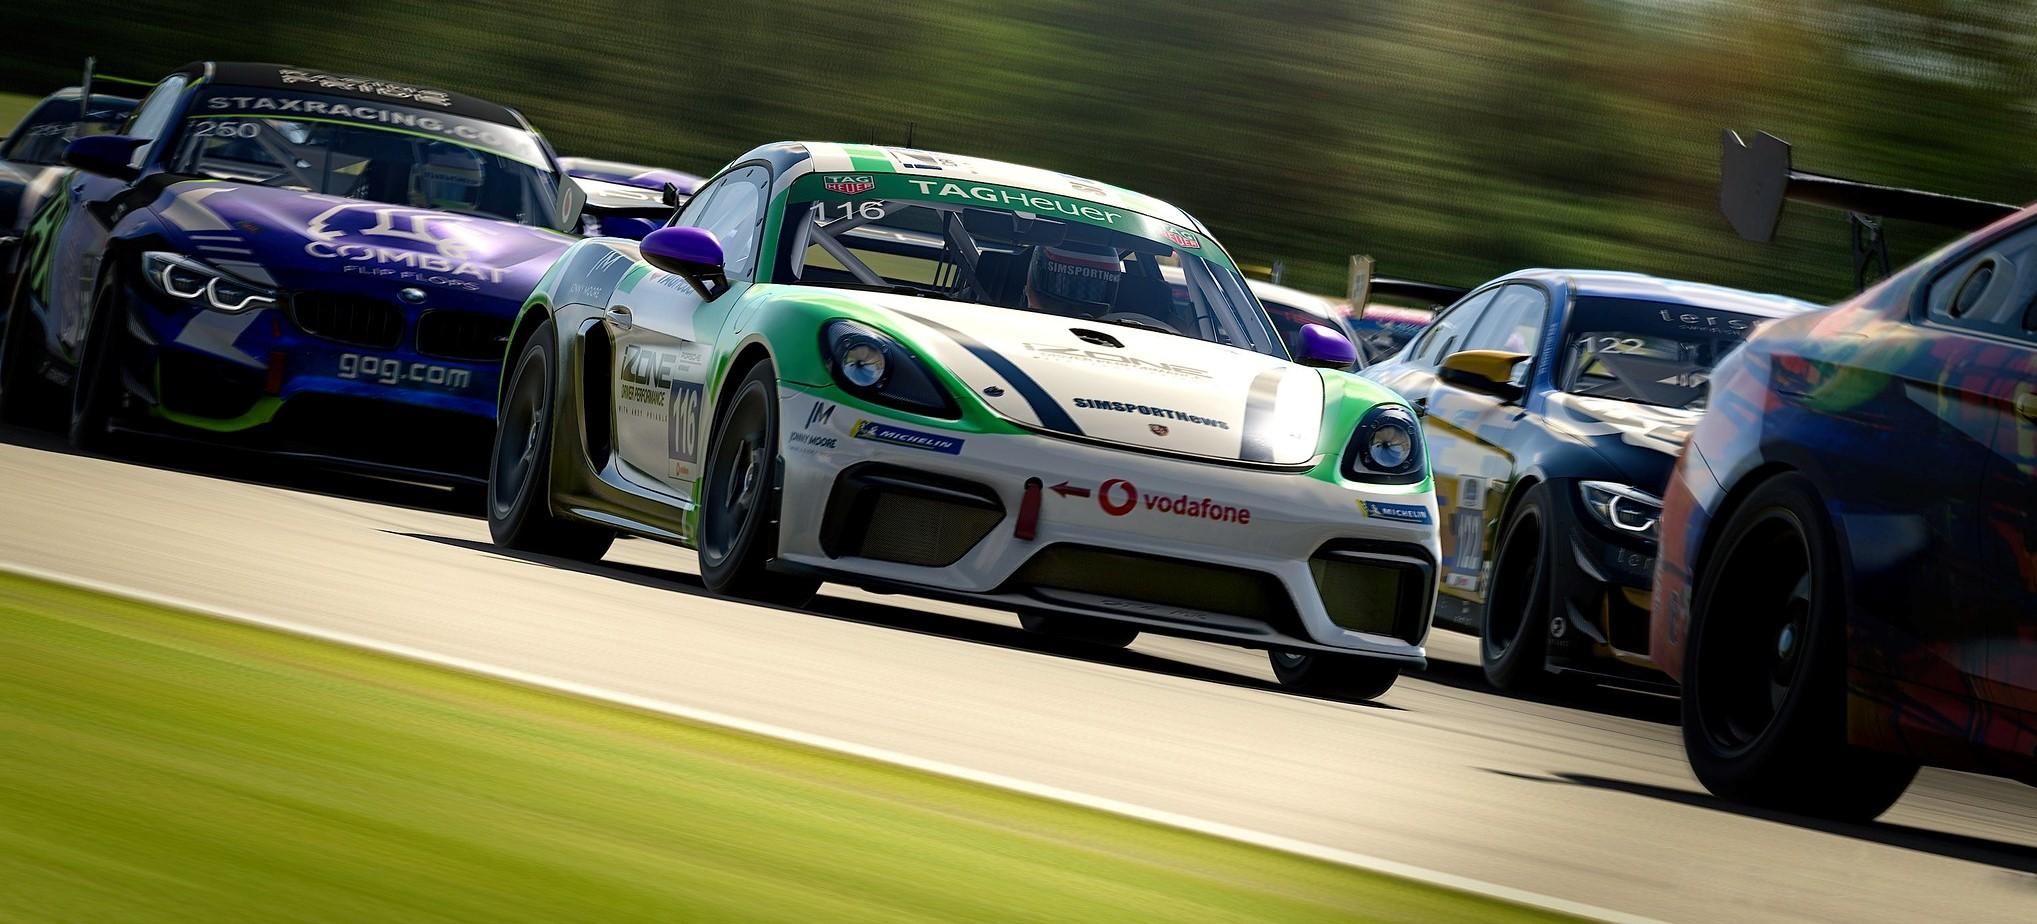 Apex Racing Academy GT4 VRS Super Series | Round 3 at Mosport (Broadcast)